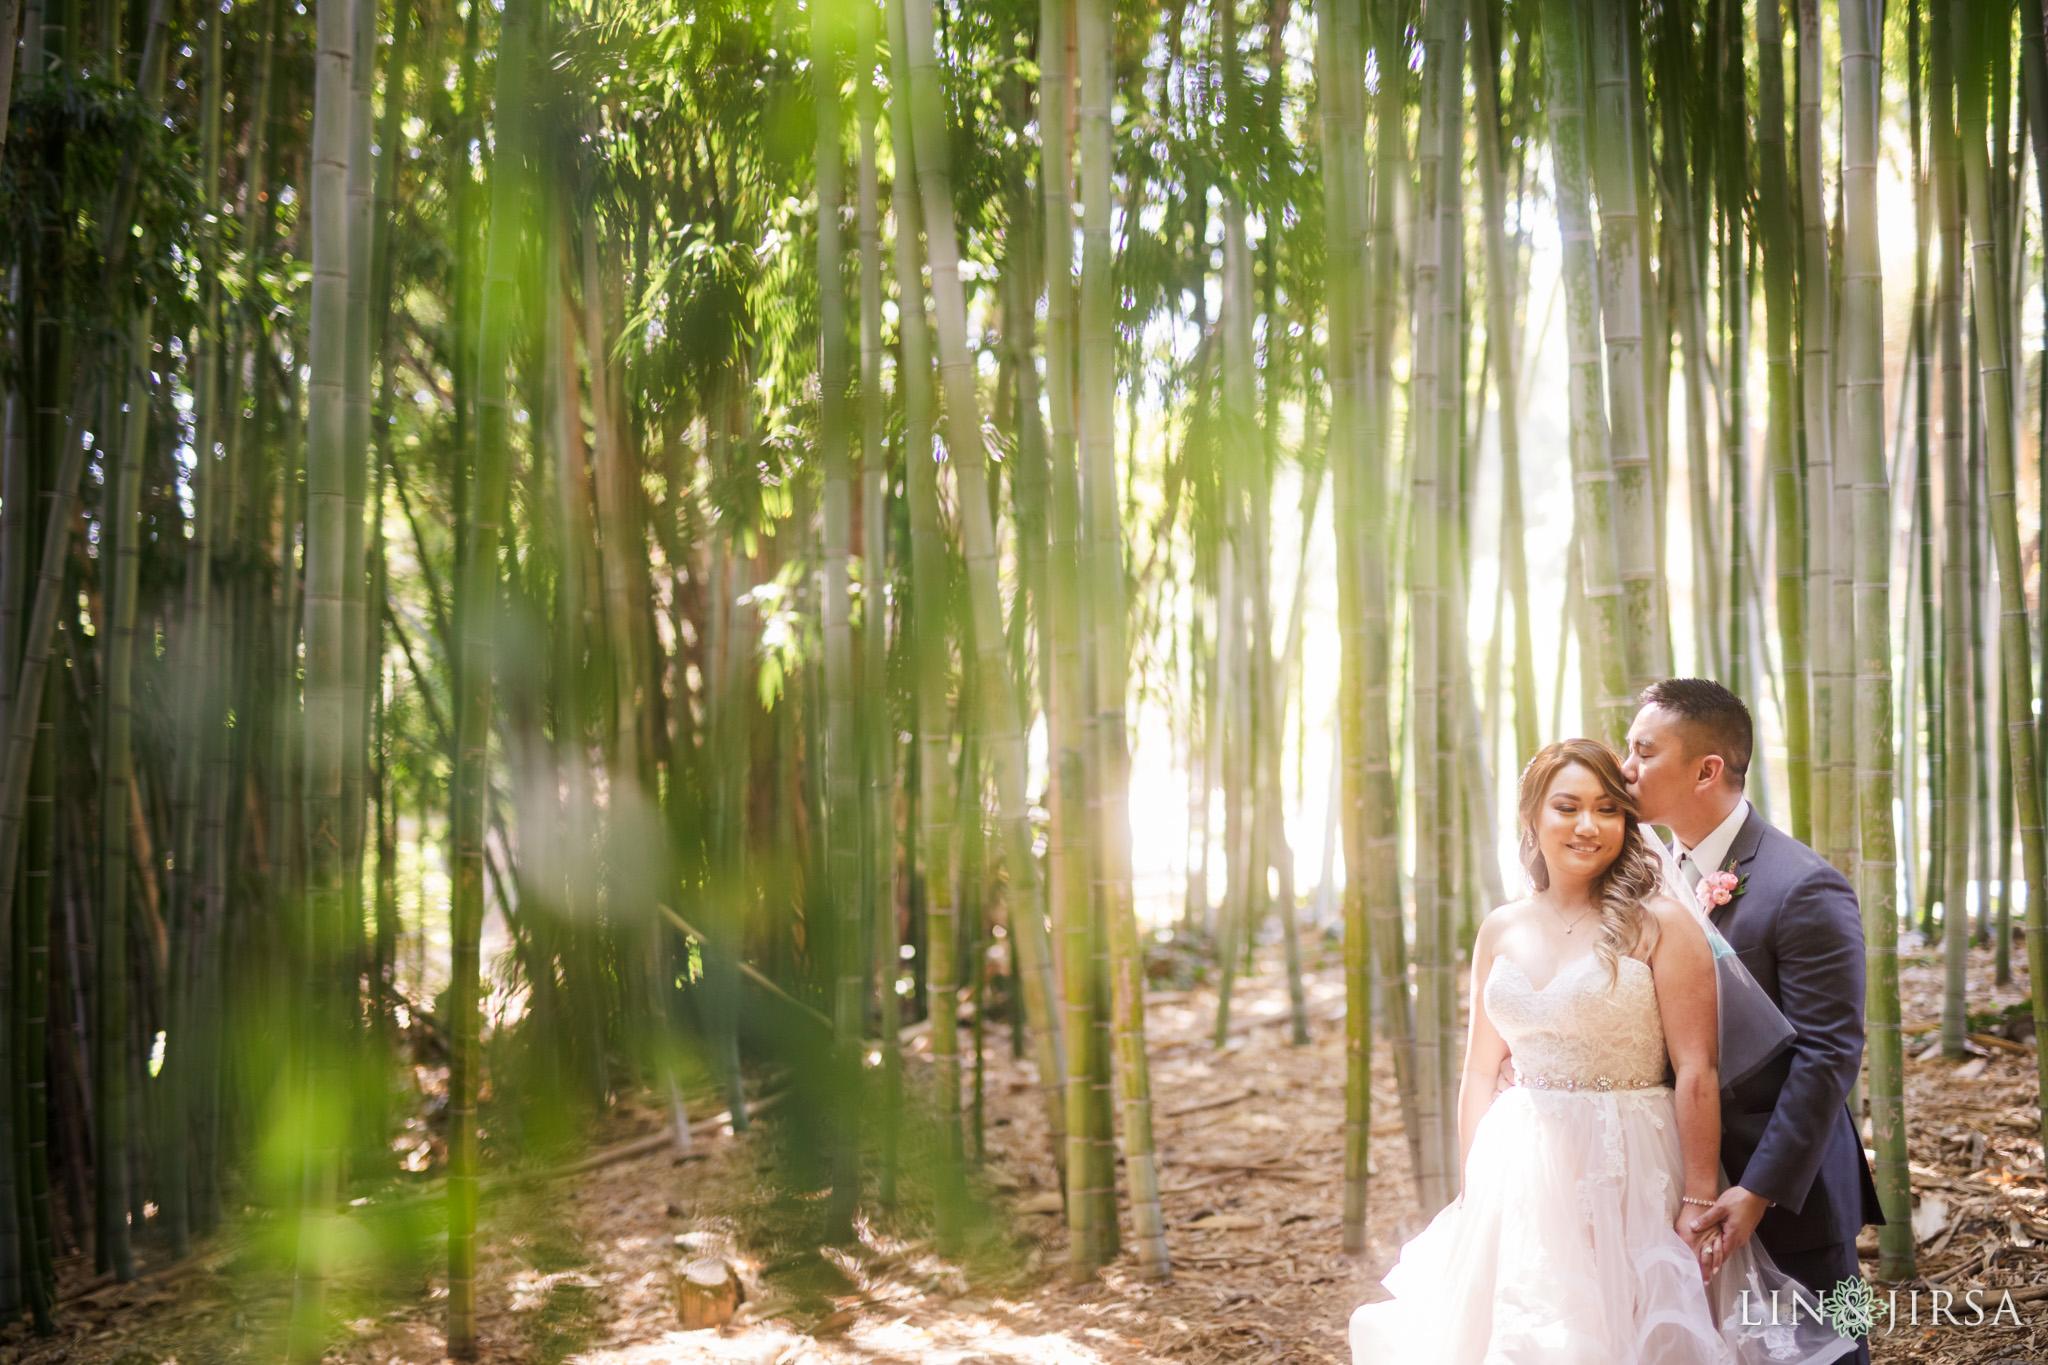 18 los angeles arboretum wedding photography